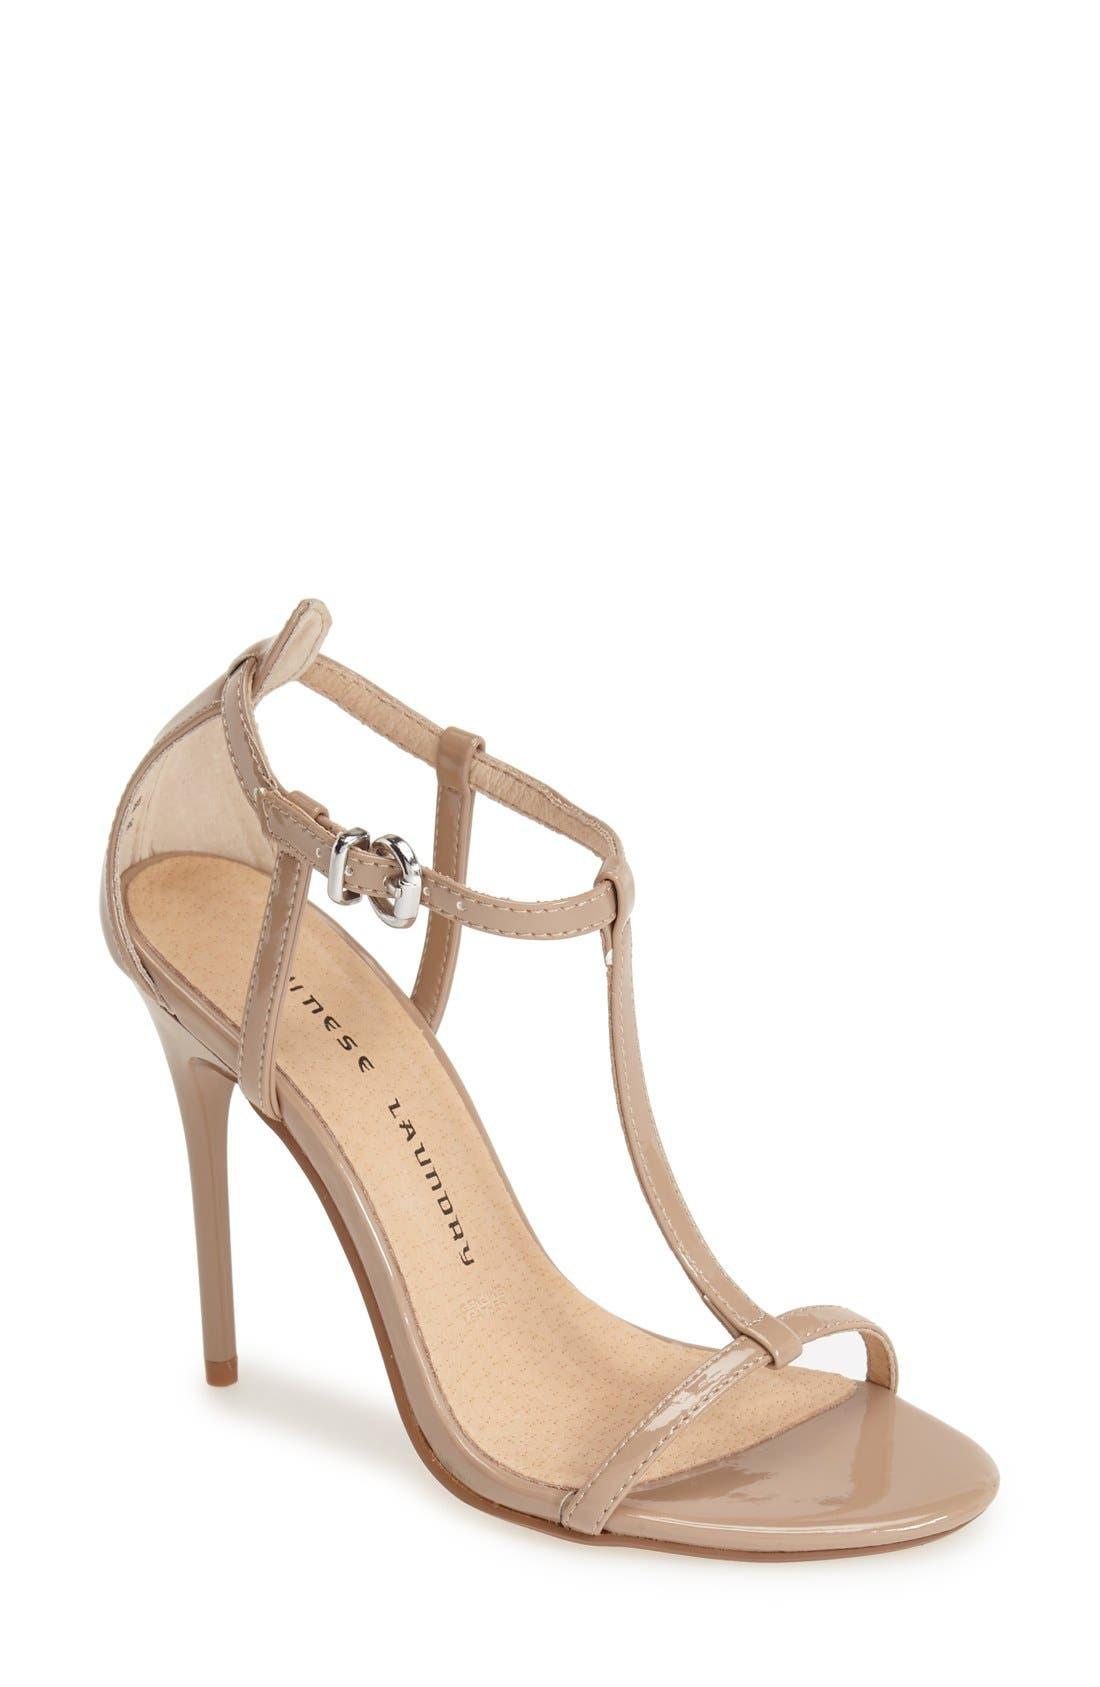 Alternate Image 1 Selected - Chinese Laundry 'Leo' Patent T-Strap Sandal (Women)